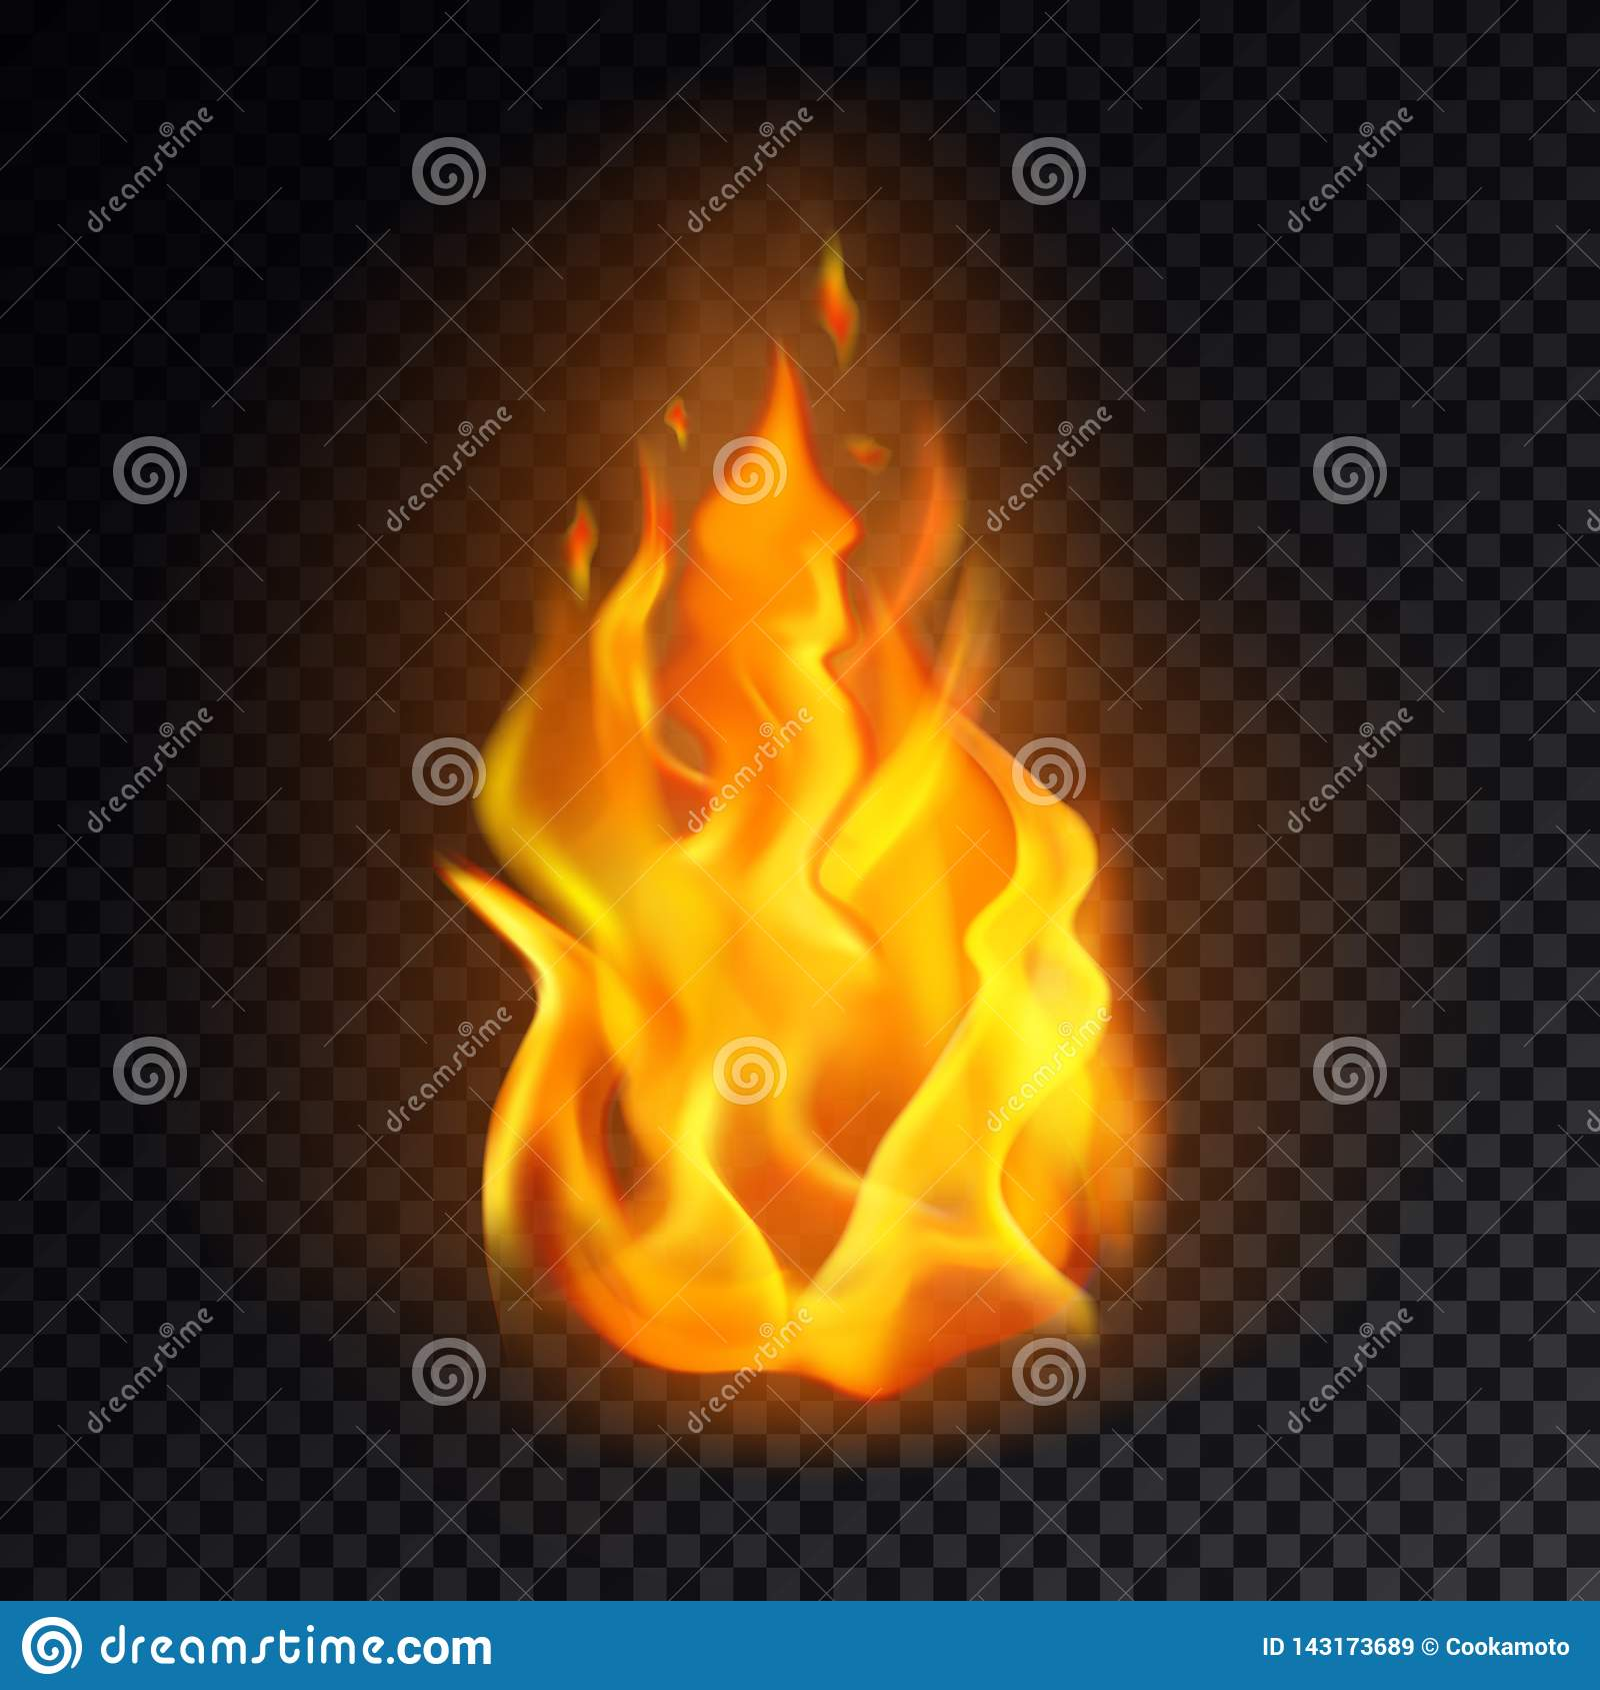 Realistic Fire Or 3d Flame, Orange Burn Emoji Stock Vector